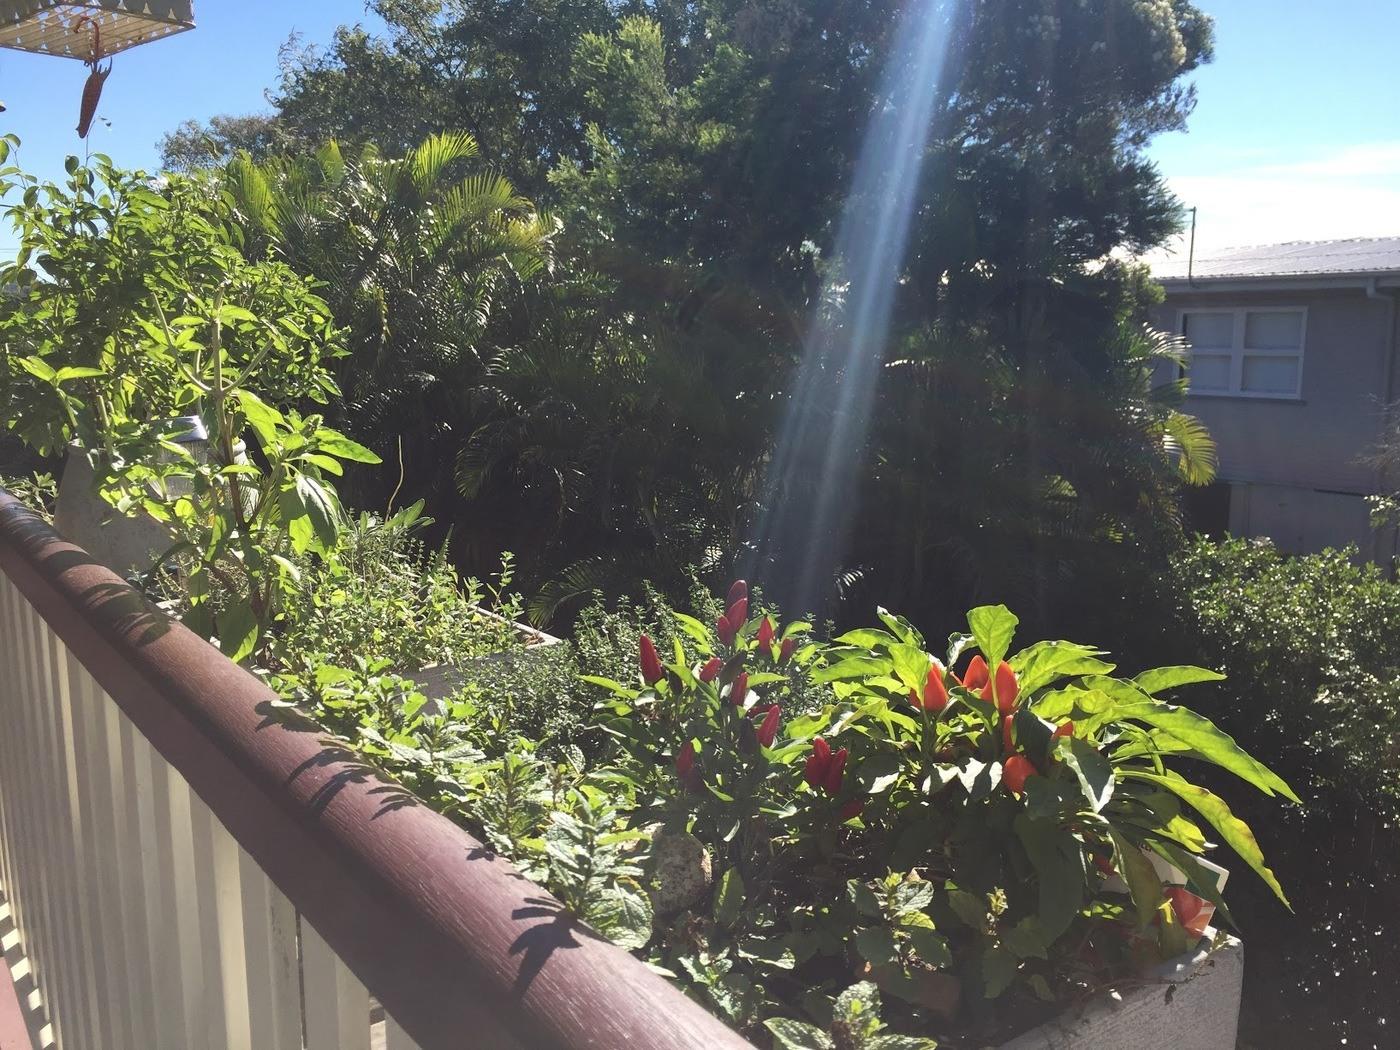 verandah garden established